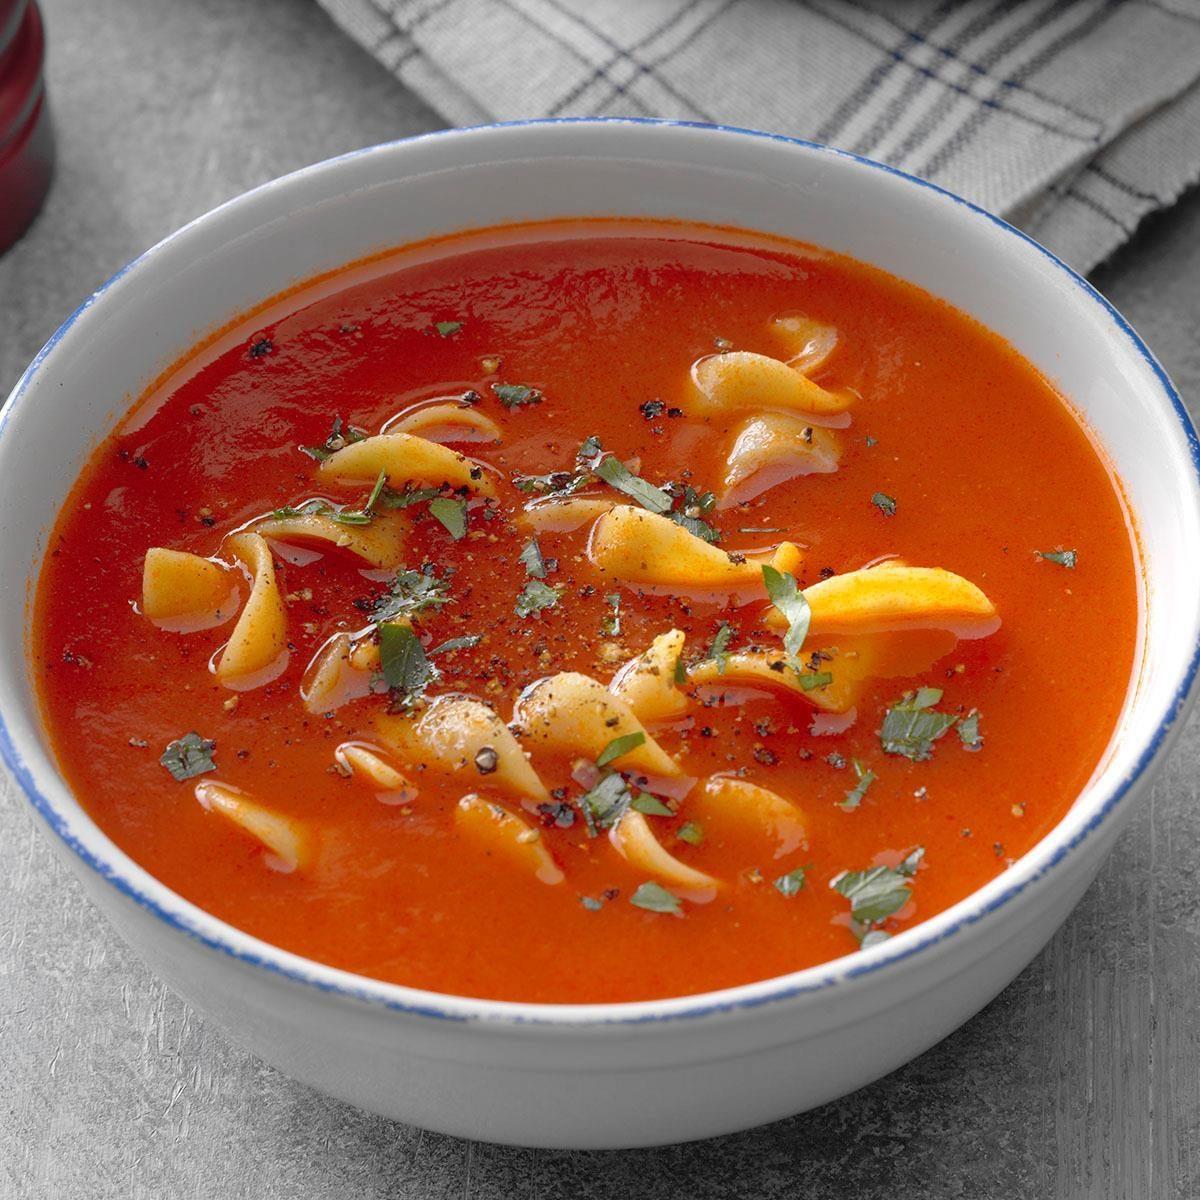 Rhode Island: Grandma's Tomato Soup